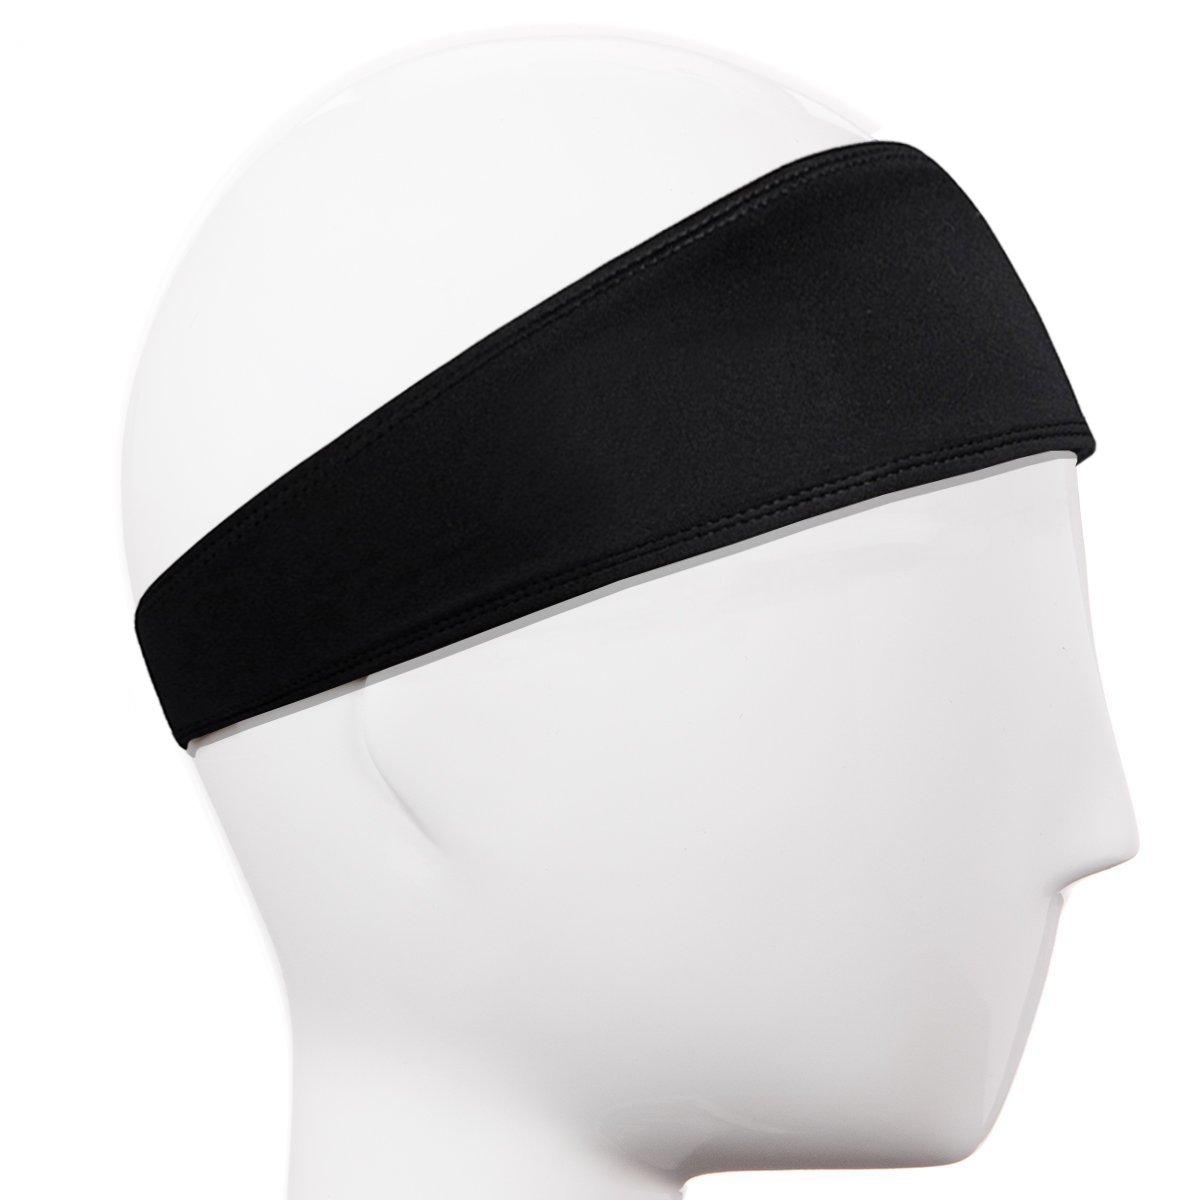 VIMOV Mens Headband - Sports Sweatband for Running f8bad03e814